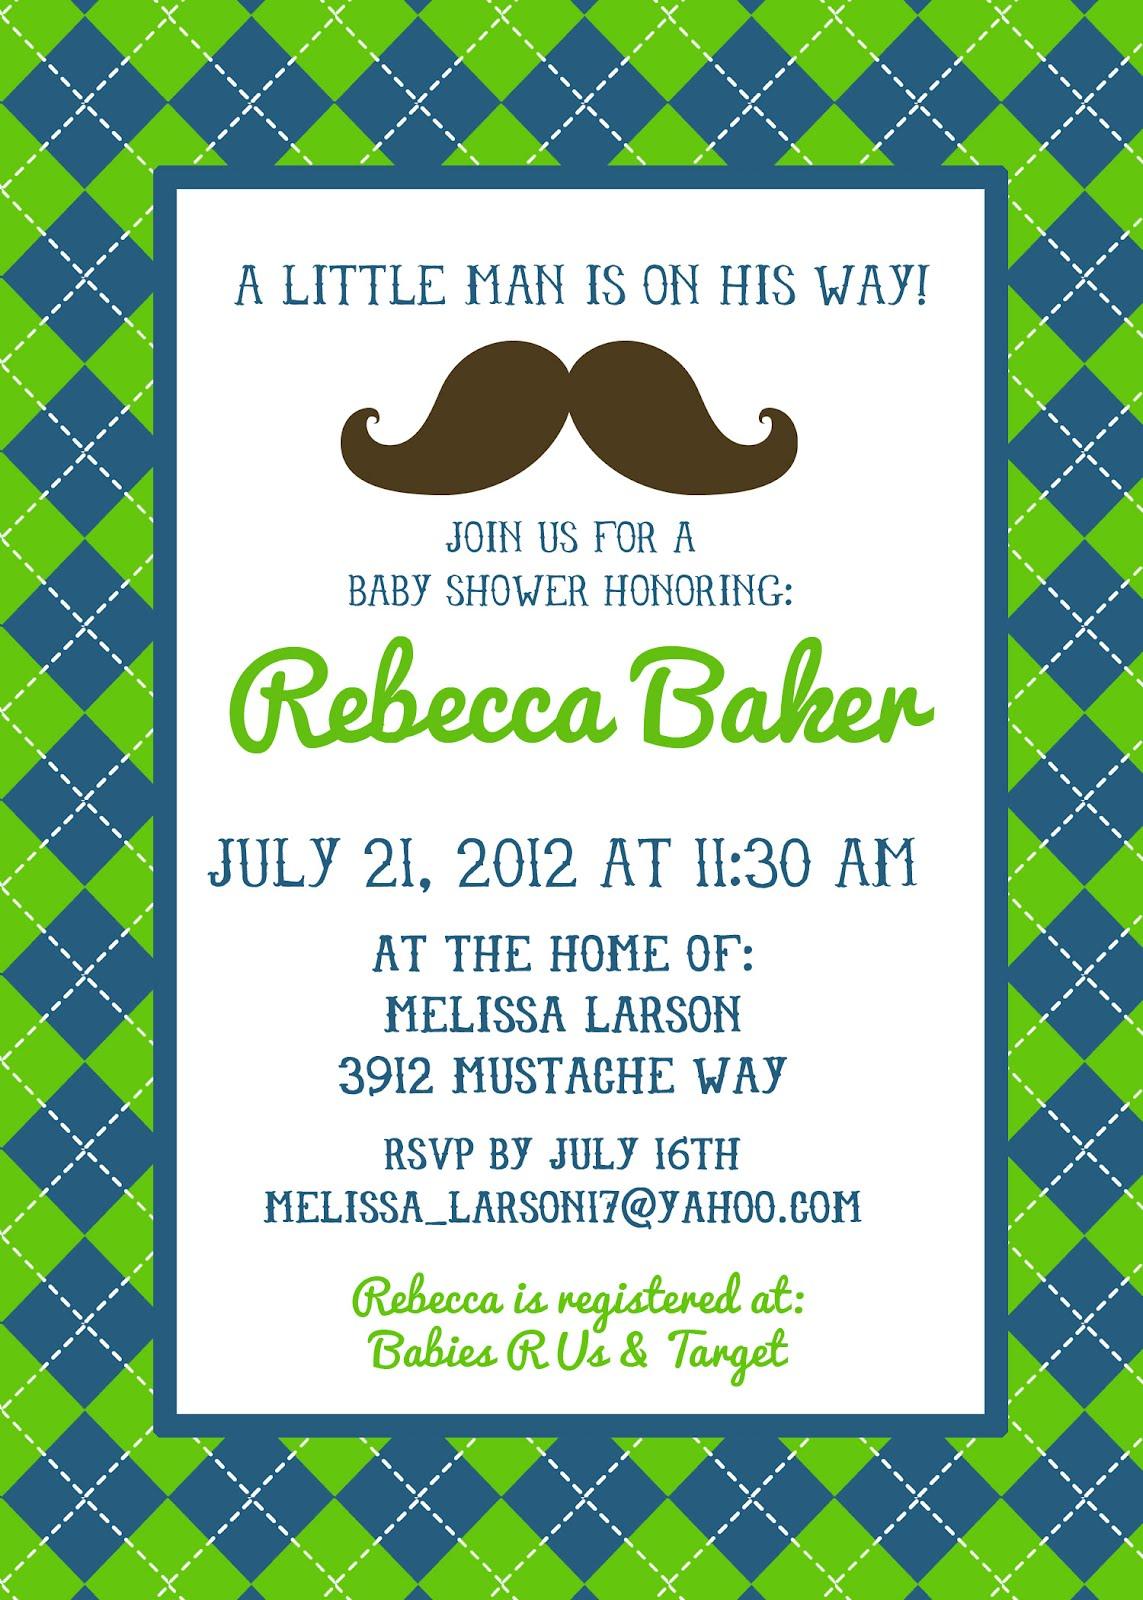 Mustache Invite is beautiful invitation layout